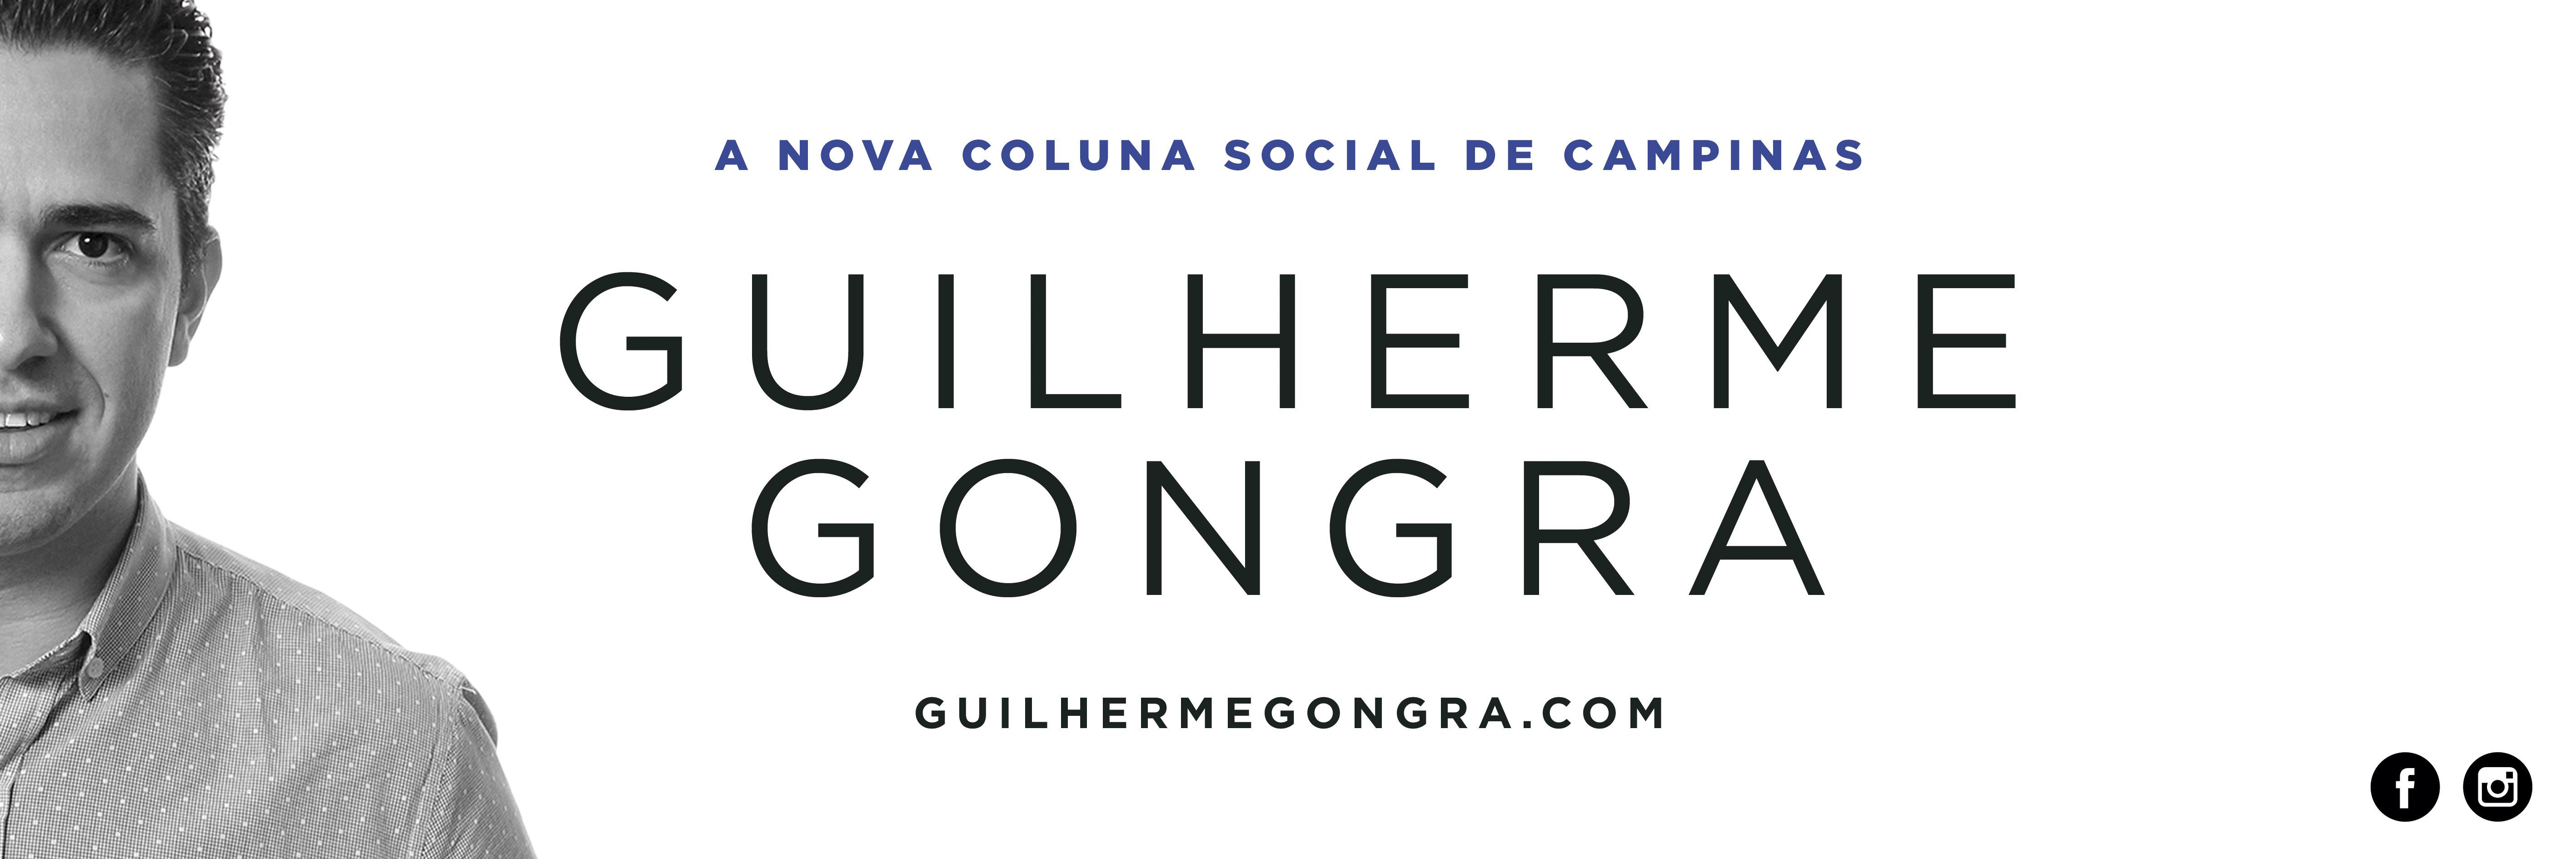 Sobre Guilherme Gongra